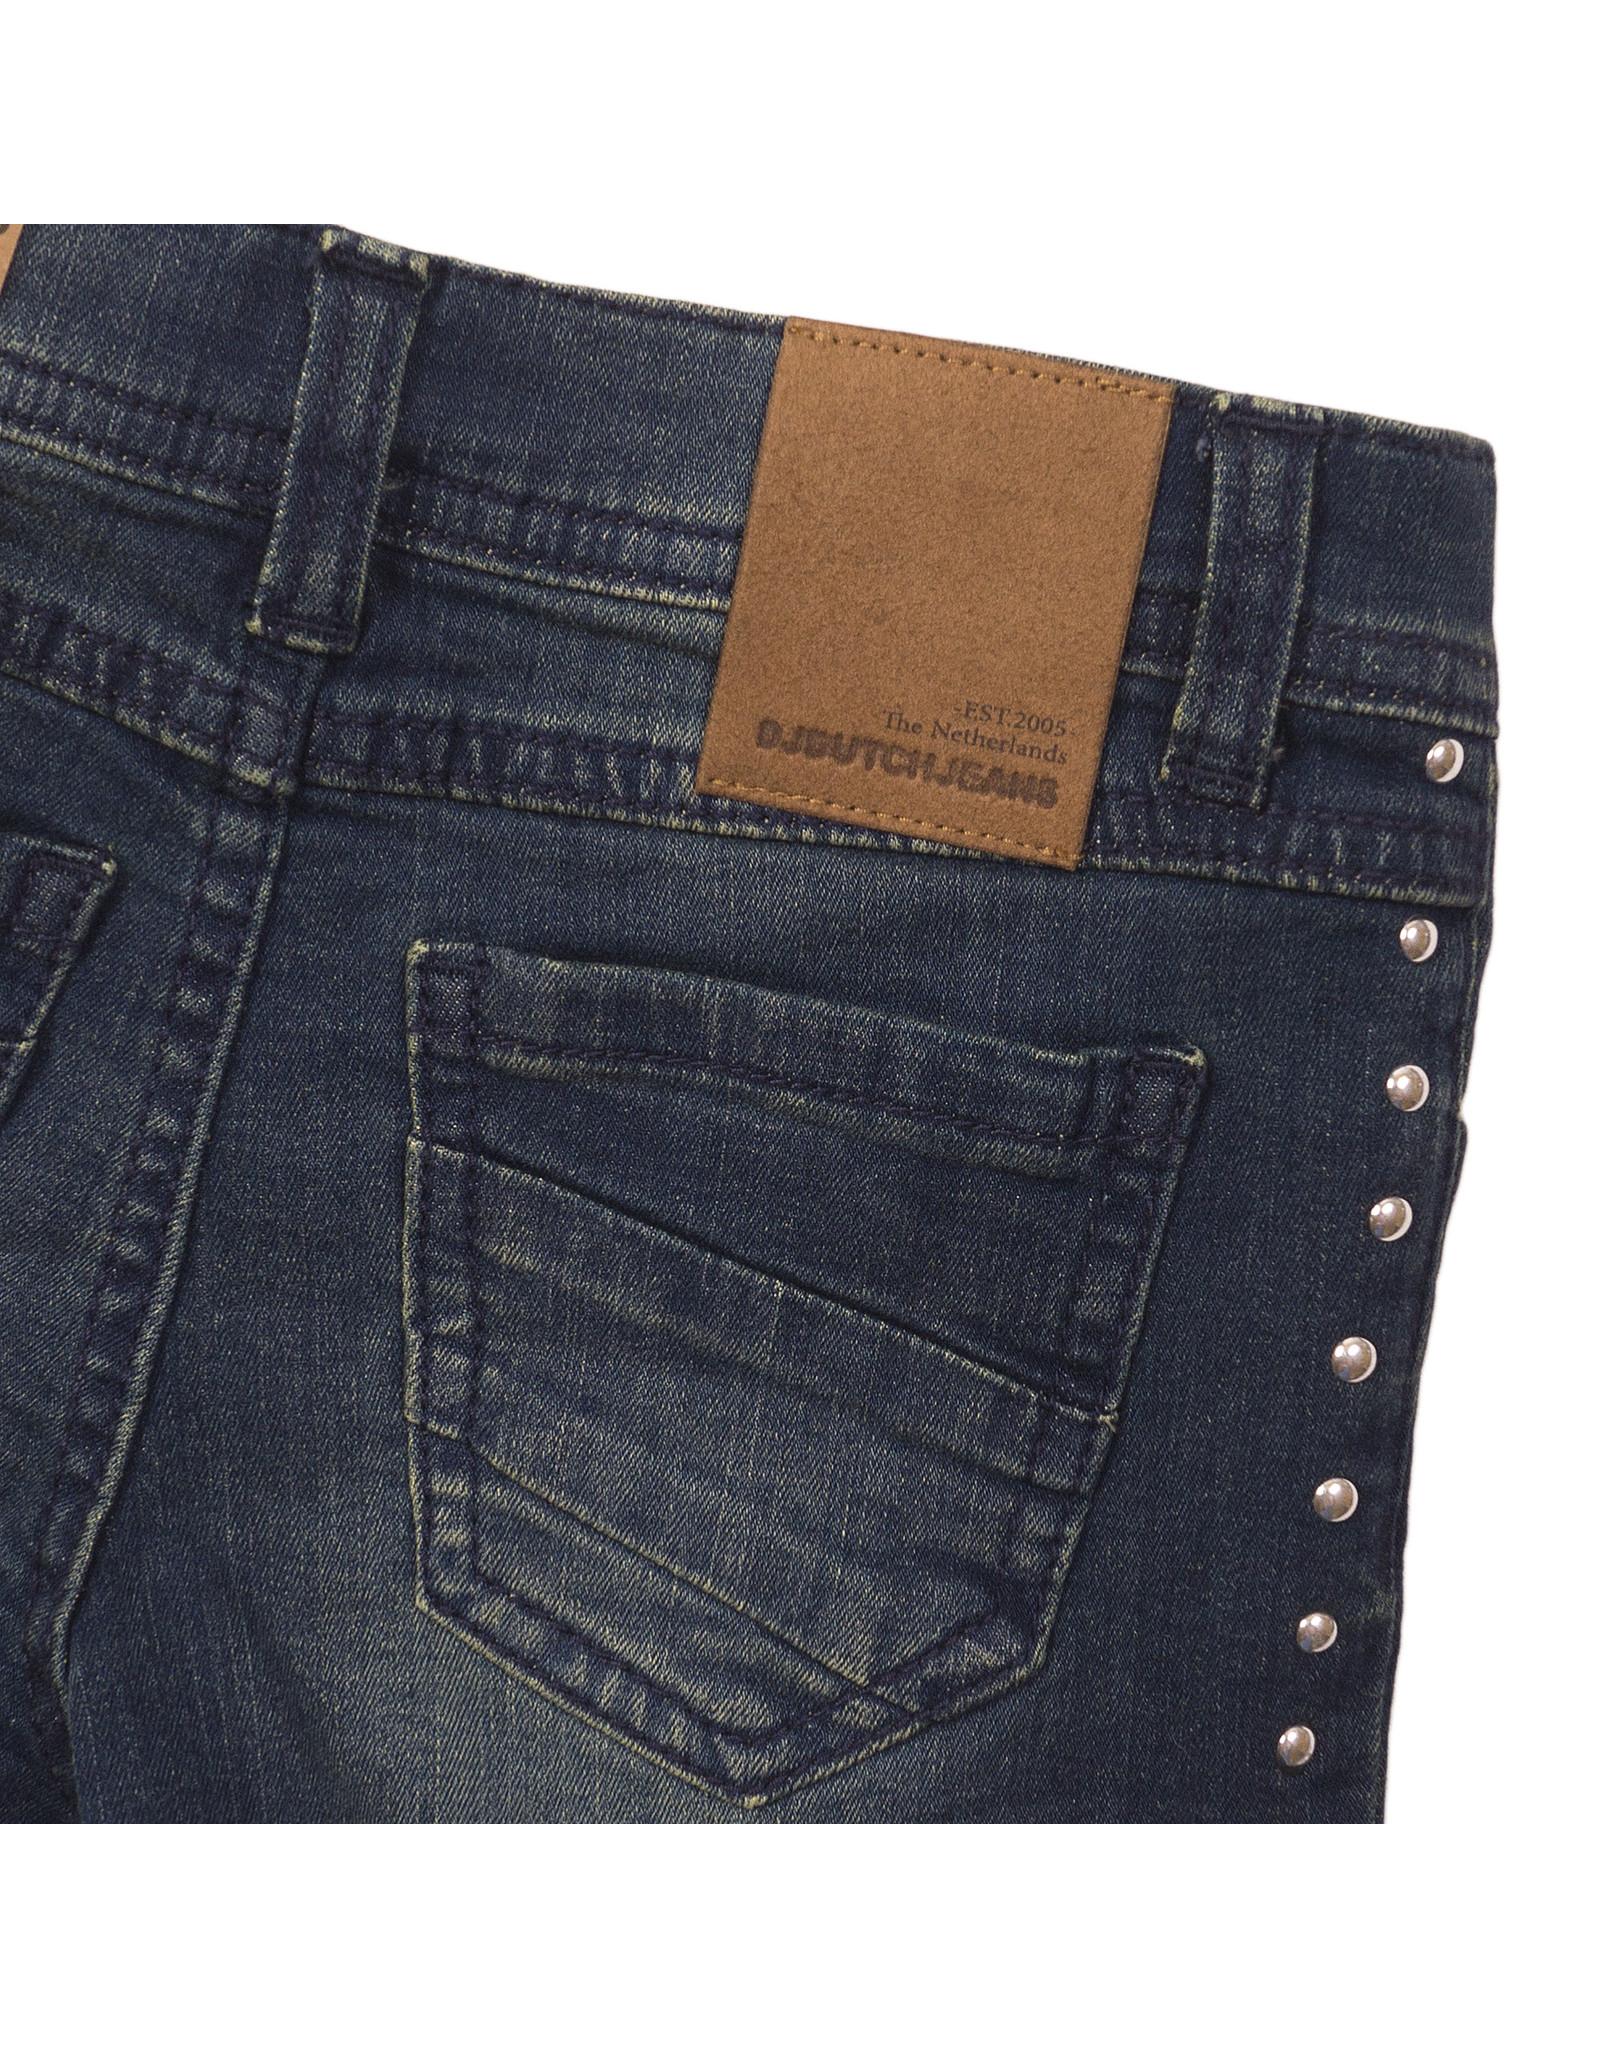 DJ Dutchjeans DJ Dutchjeans meisjes korte jeans met stuts Blue